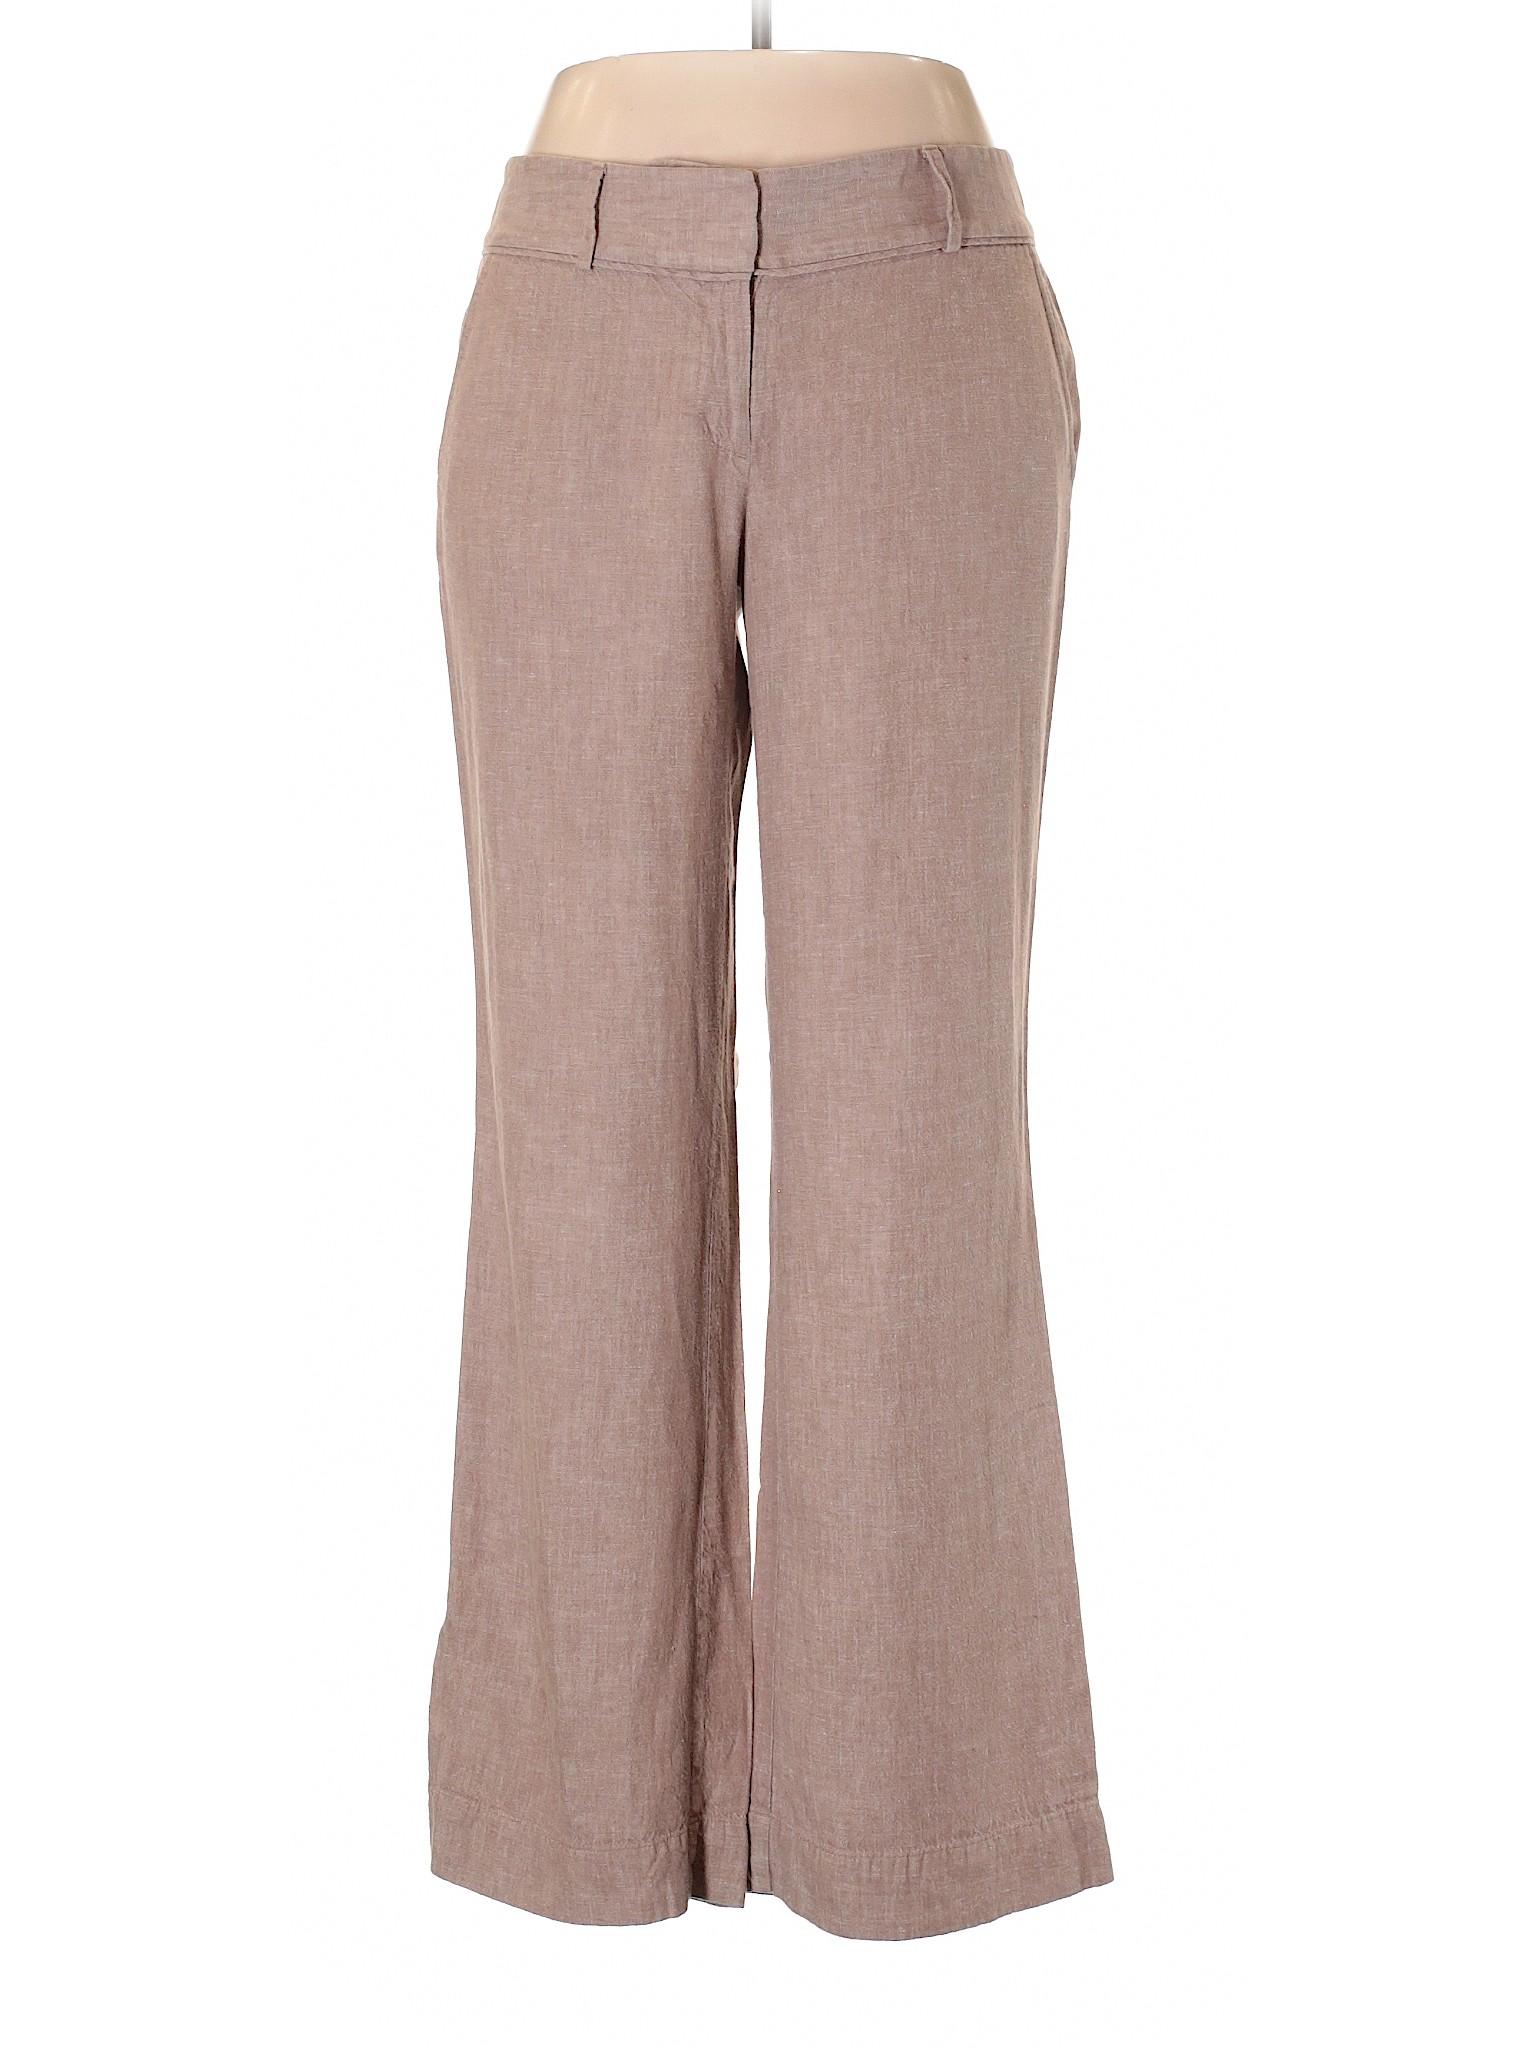 Ann Taylor Boutique Linen Pants LOFT 8z7w0Z